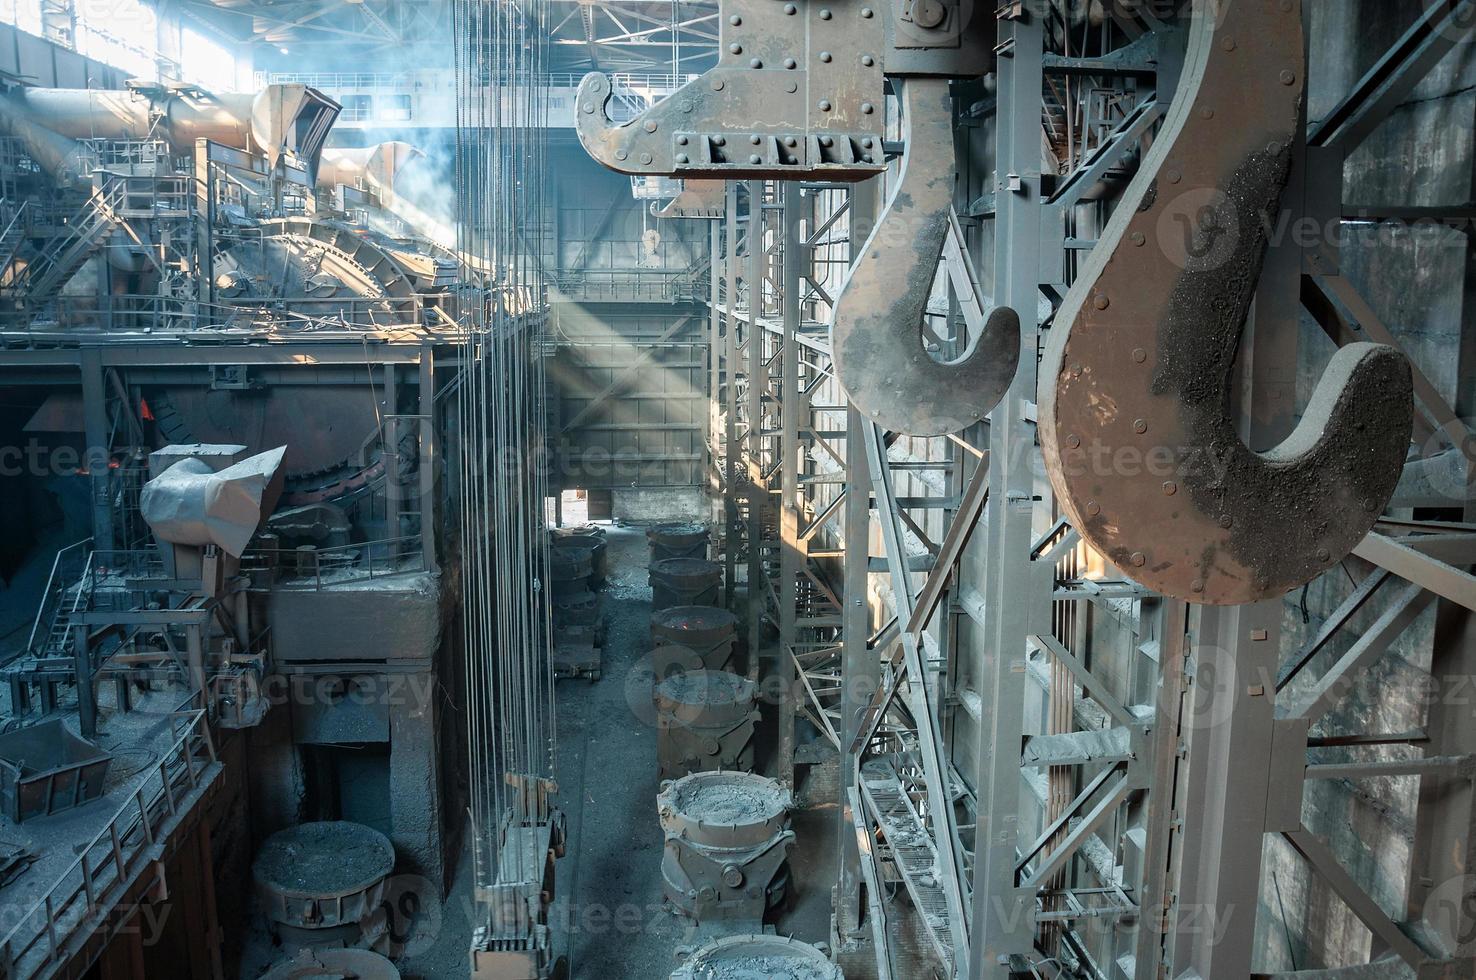 metallurgical works photo